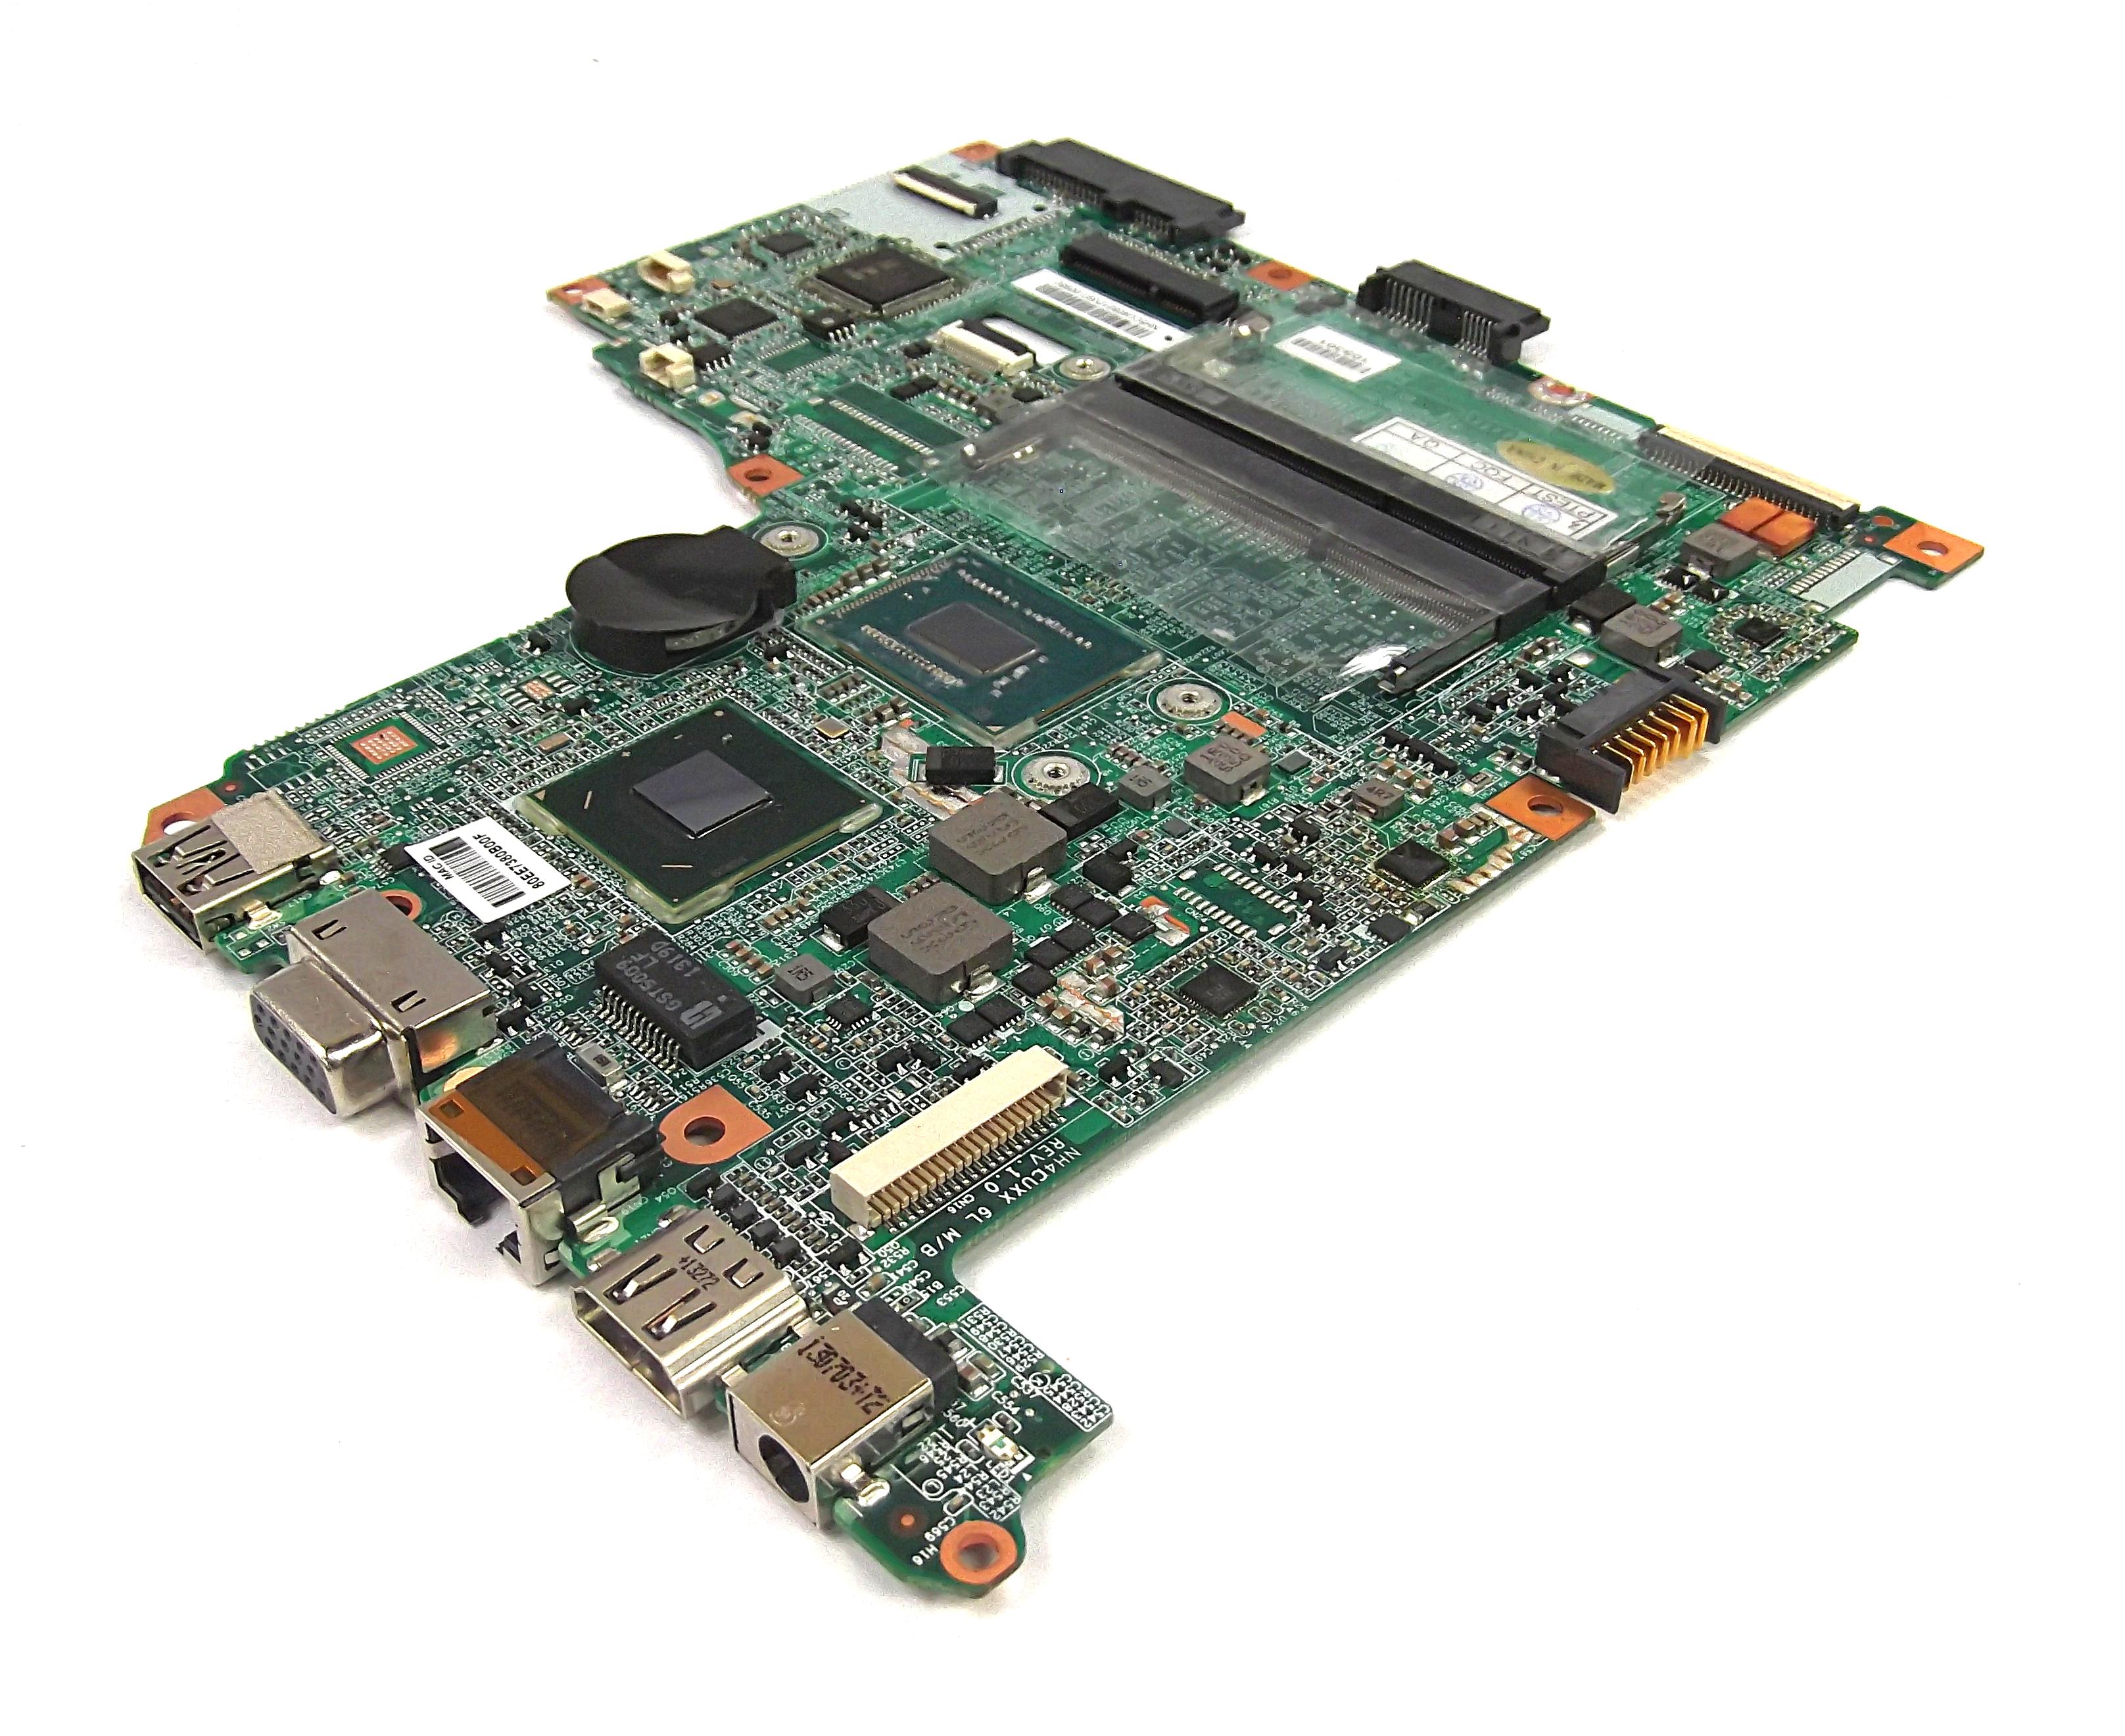 Advent NH5CU00001D45T Laptop Motherboard with BGA Intel SR0VQ CPU - E326167 TC-1